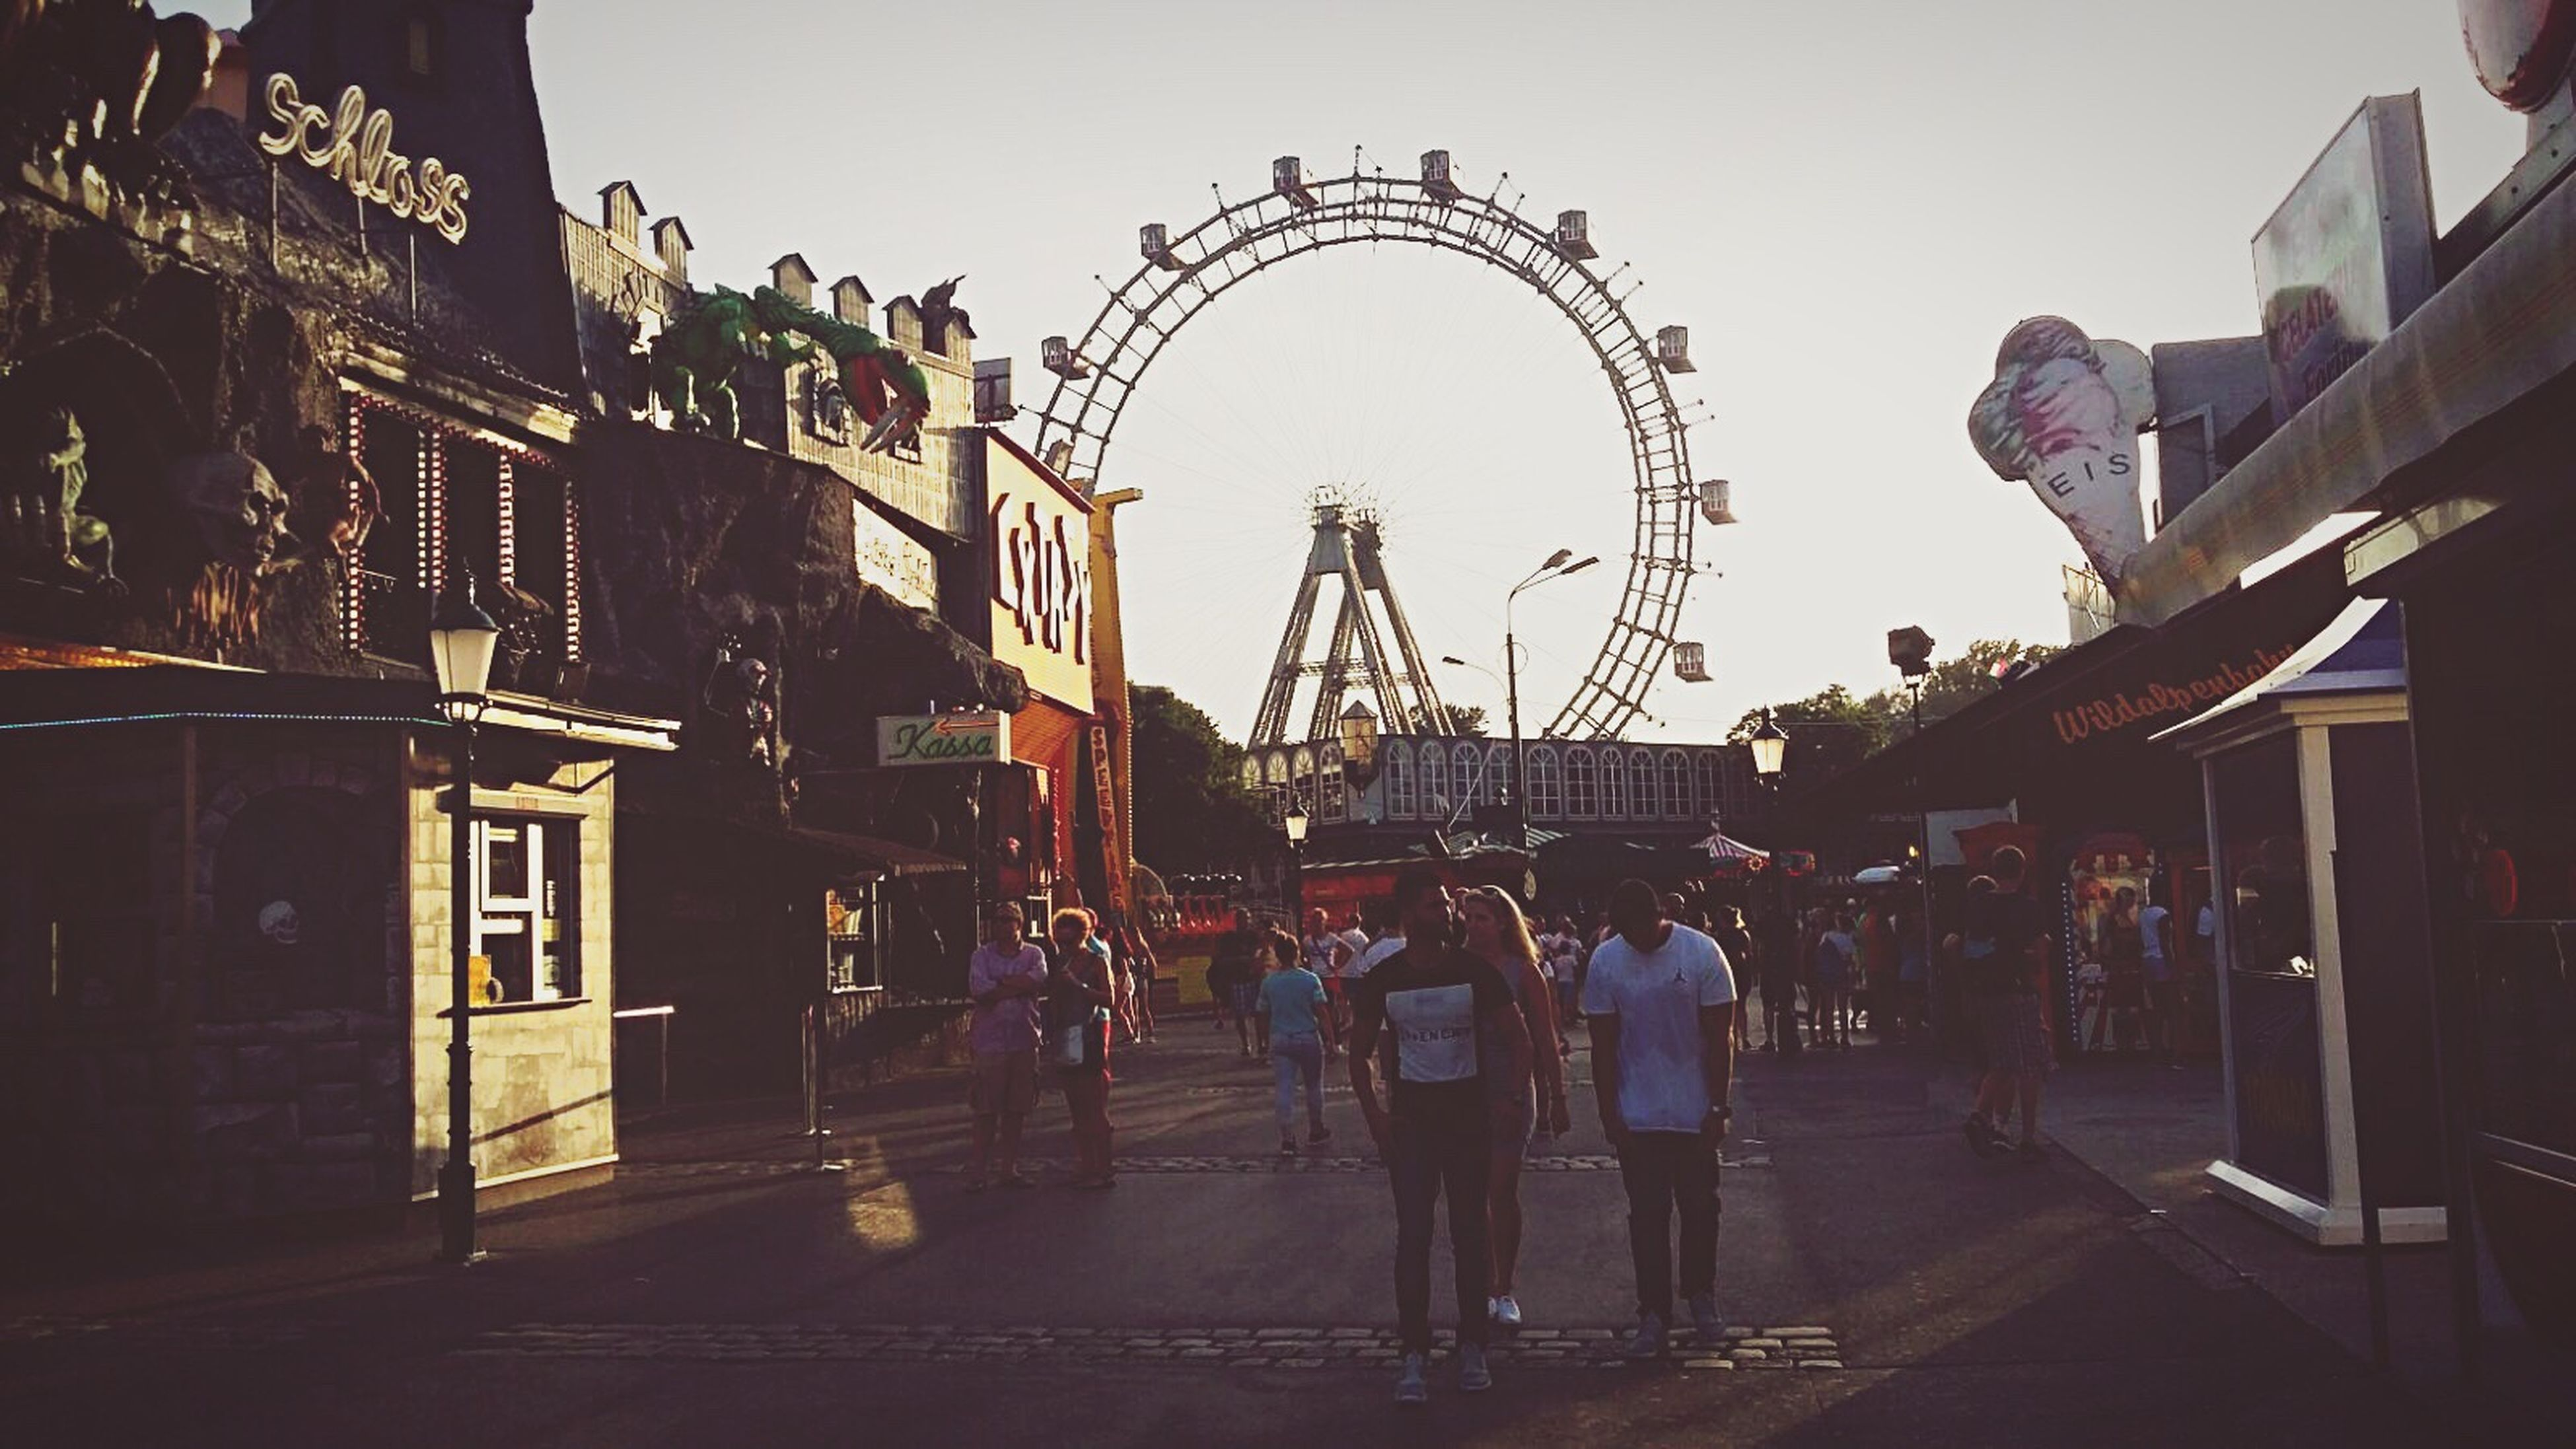 architecture, built structure, building exterior, ferris wheel, amusement park, city life, walking, clear sky, city, leisure activity, street, amusement park ride, person, group of people, city street, day, sky, outdoors, pedestrian, narrow